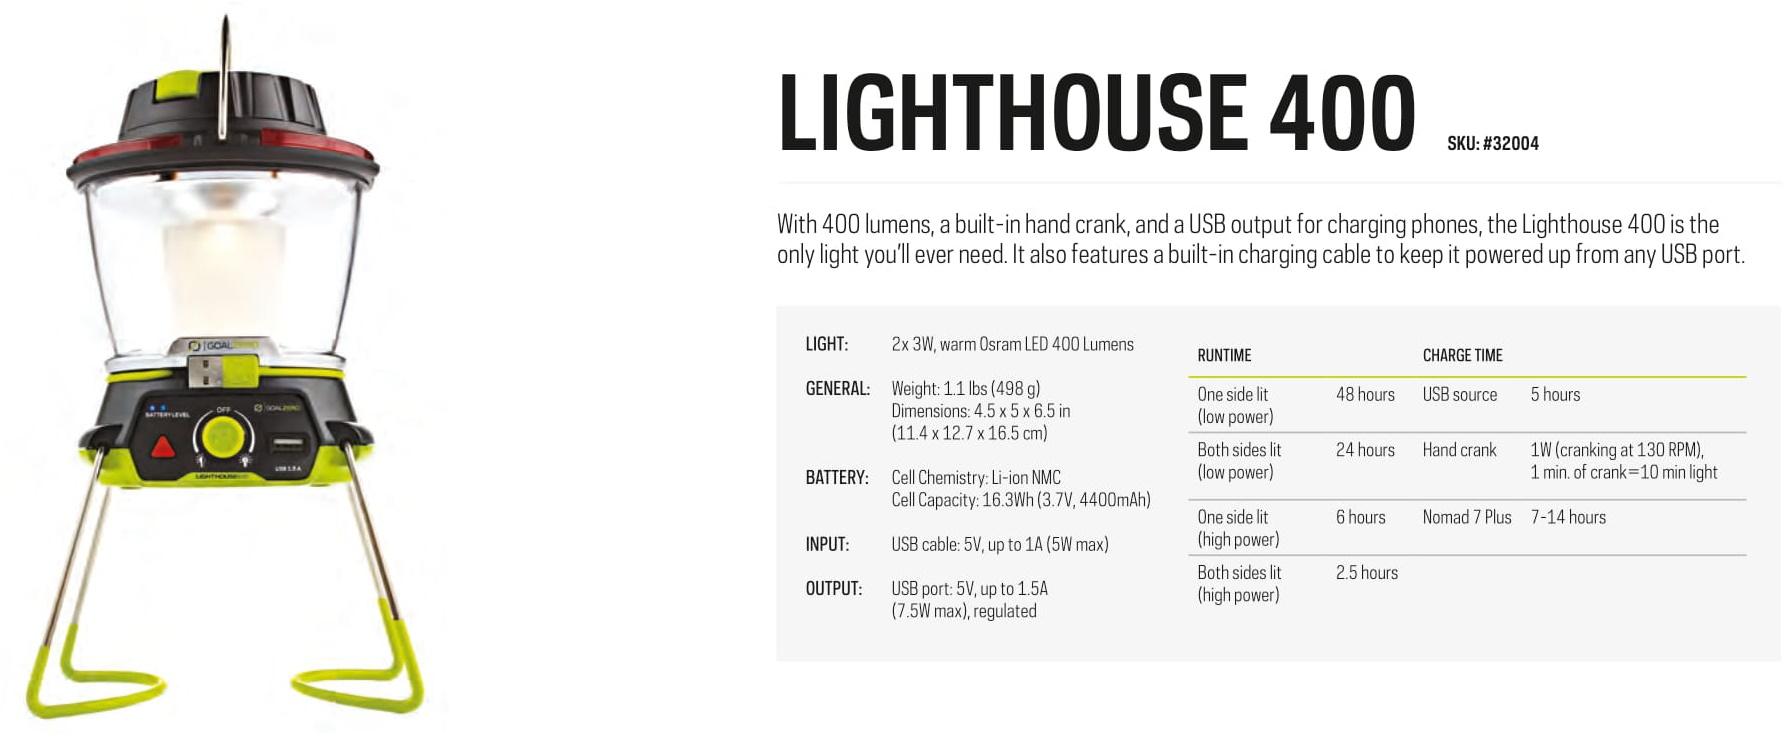 Goal Zero Lighthouse 400 Lantern & USB Power Hub, rechargeable, usb power hub, port, charge phone, outdoor lantern light 400 lumens